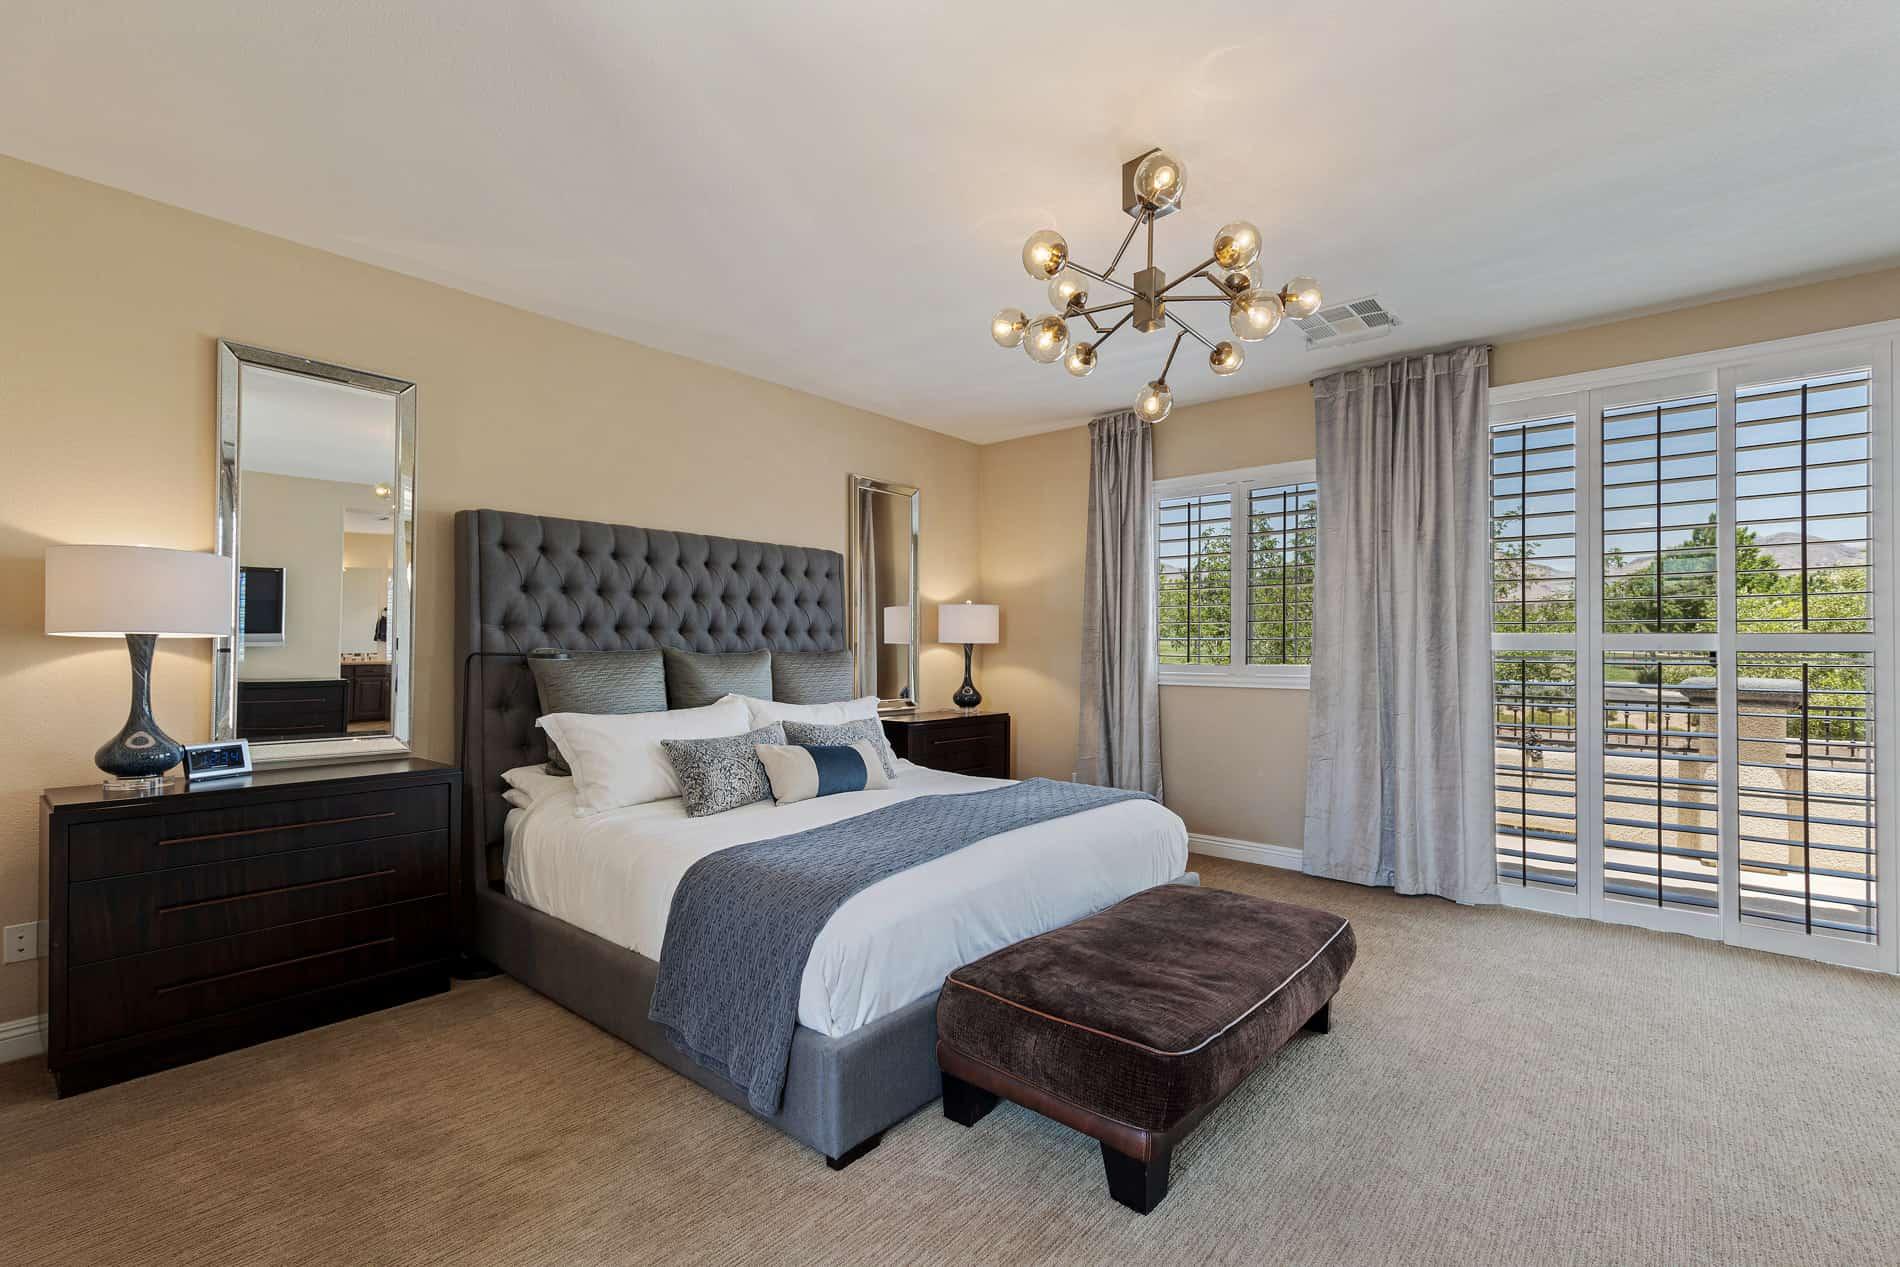 las-vegas-luxry-real-estate-realtor-rob-jensen-company-12108-vista-linda-avenue-the-paseos038